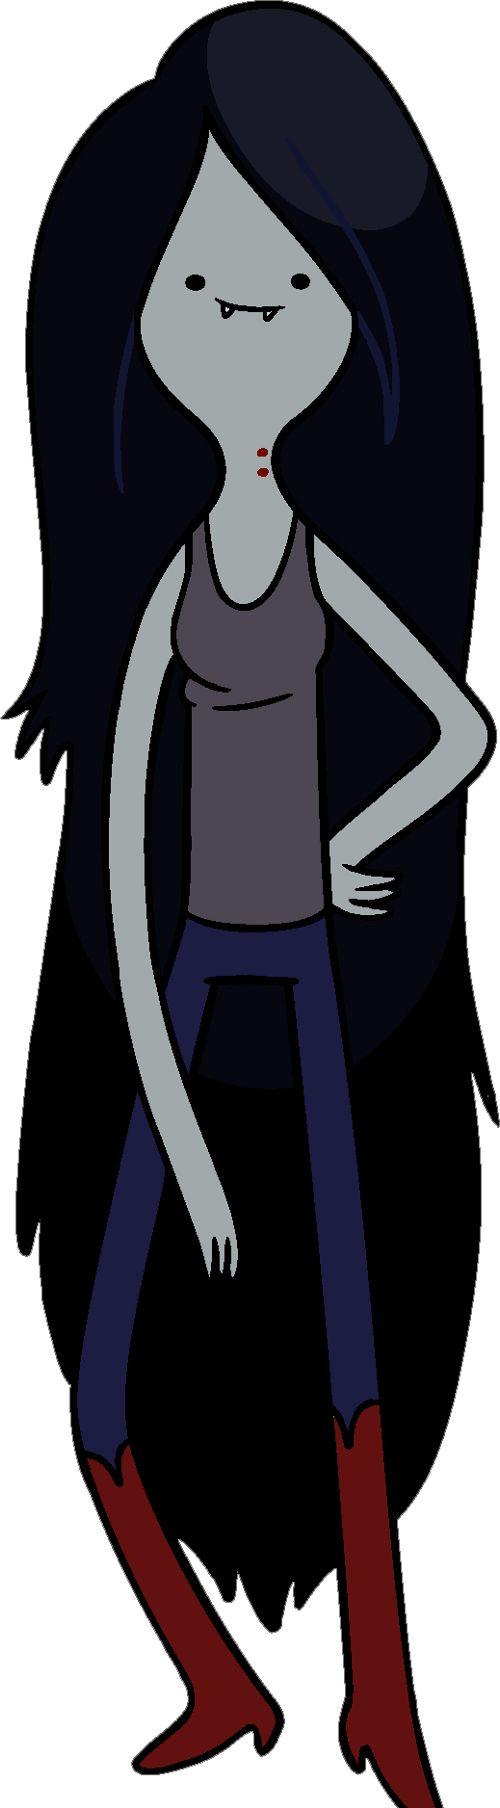 Adventure Time - Marceline